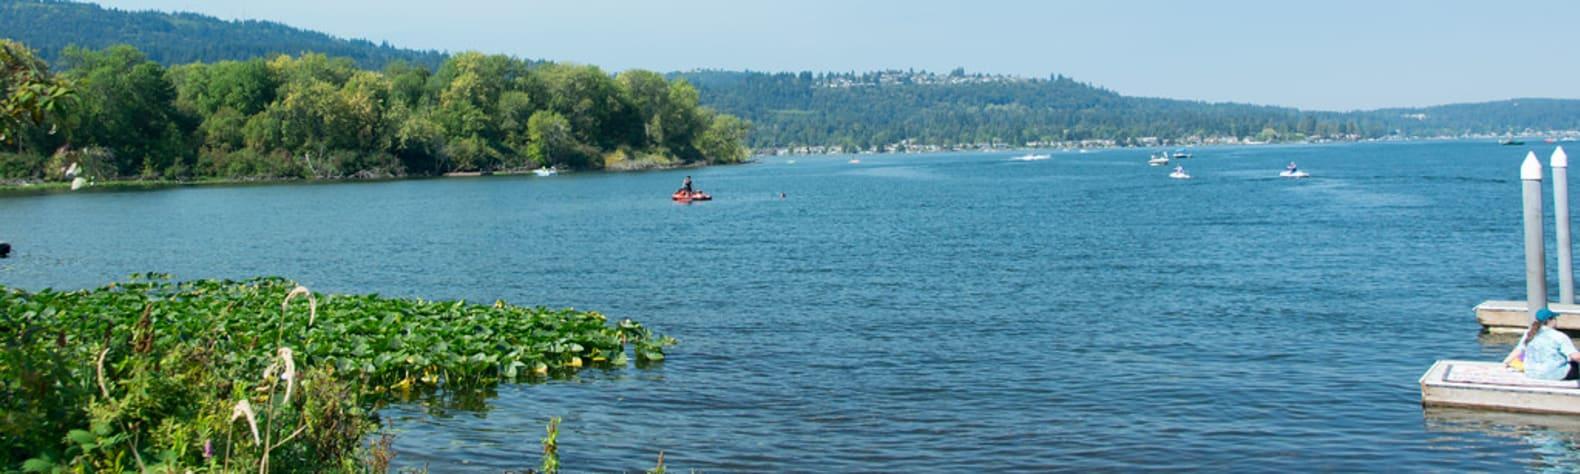 Lake Sammamish State Park